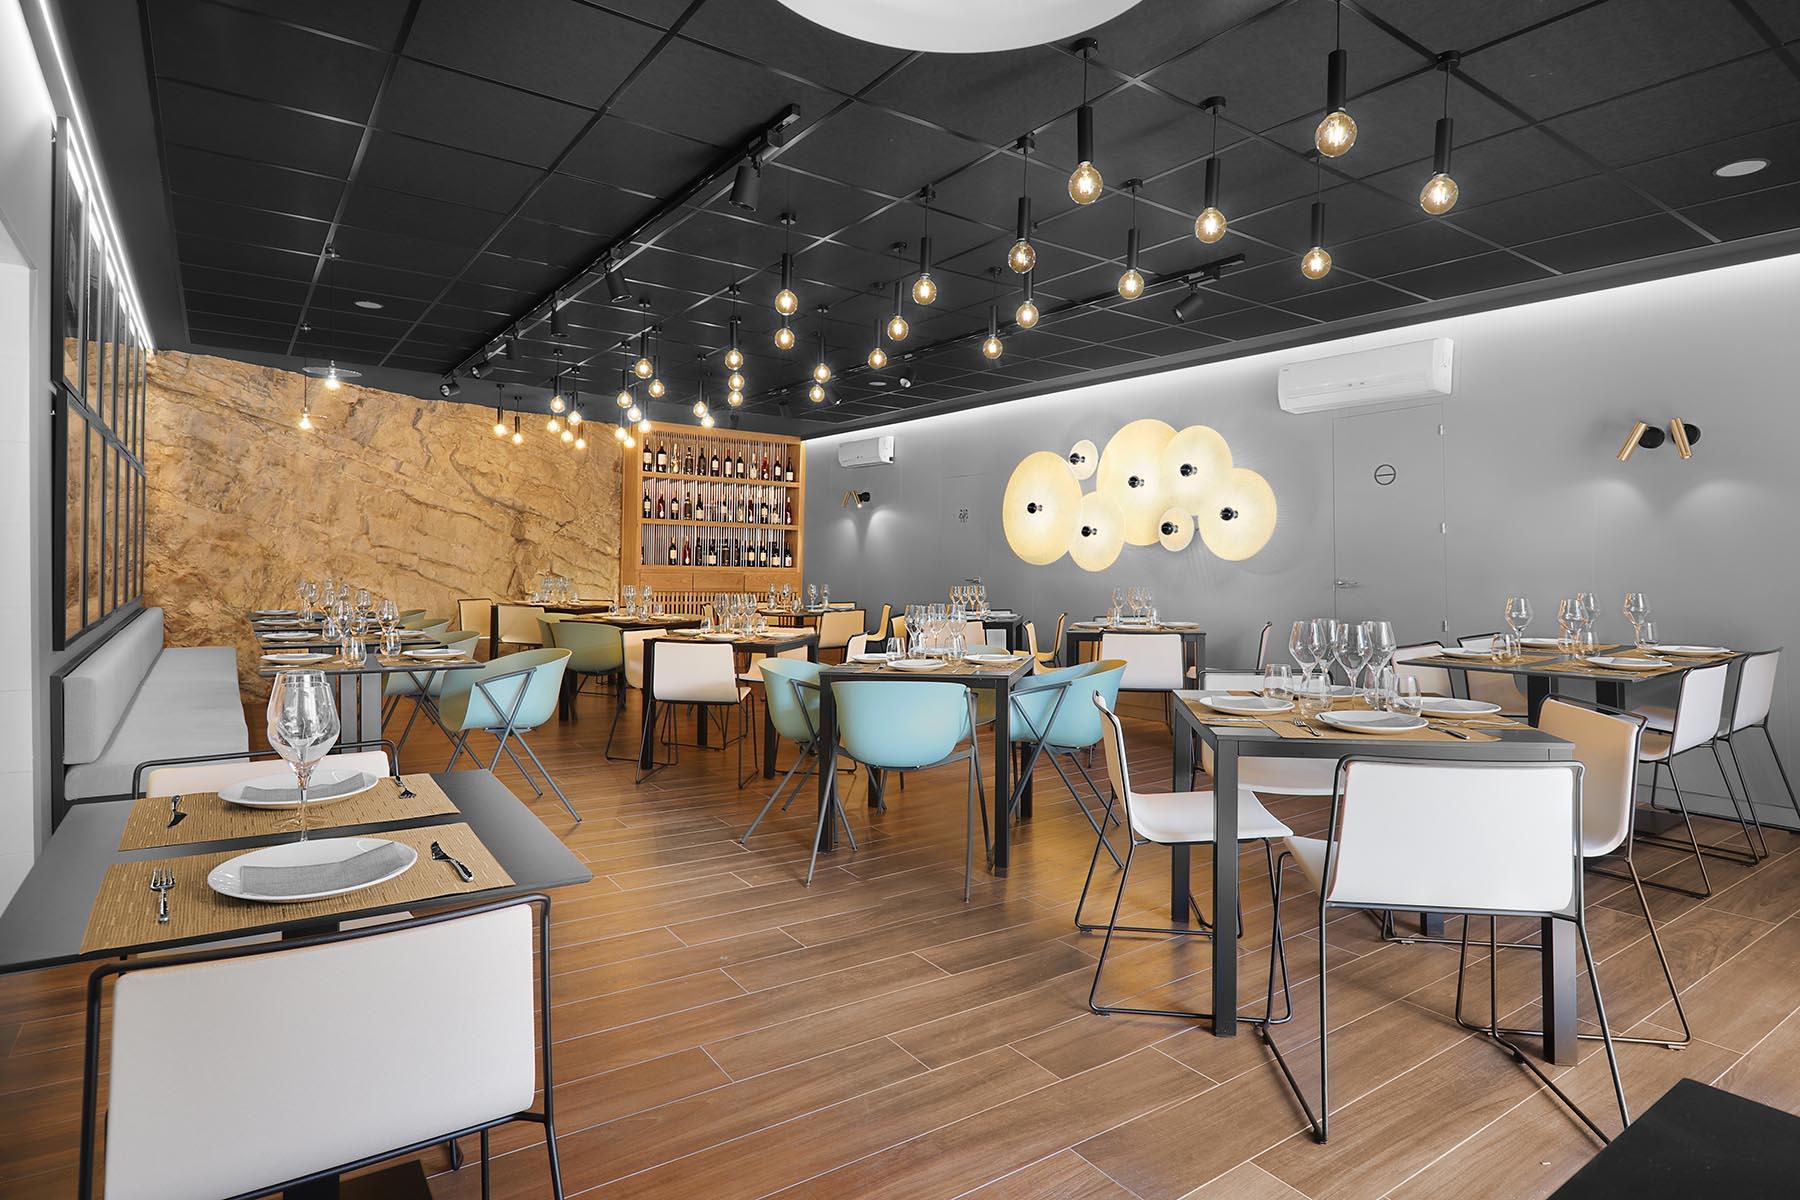 miguel_rosan_fotografia_profesional_restaurante_senyorio_de_albarracin_3355